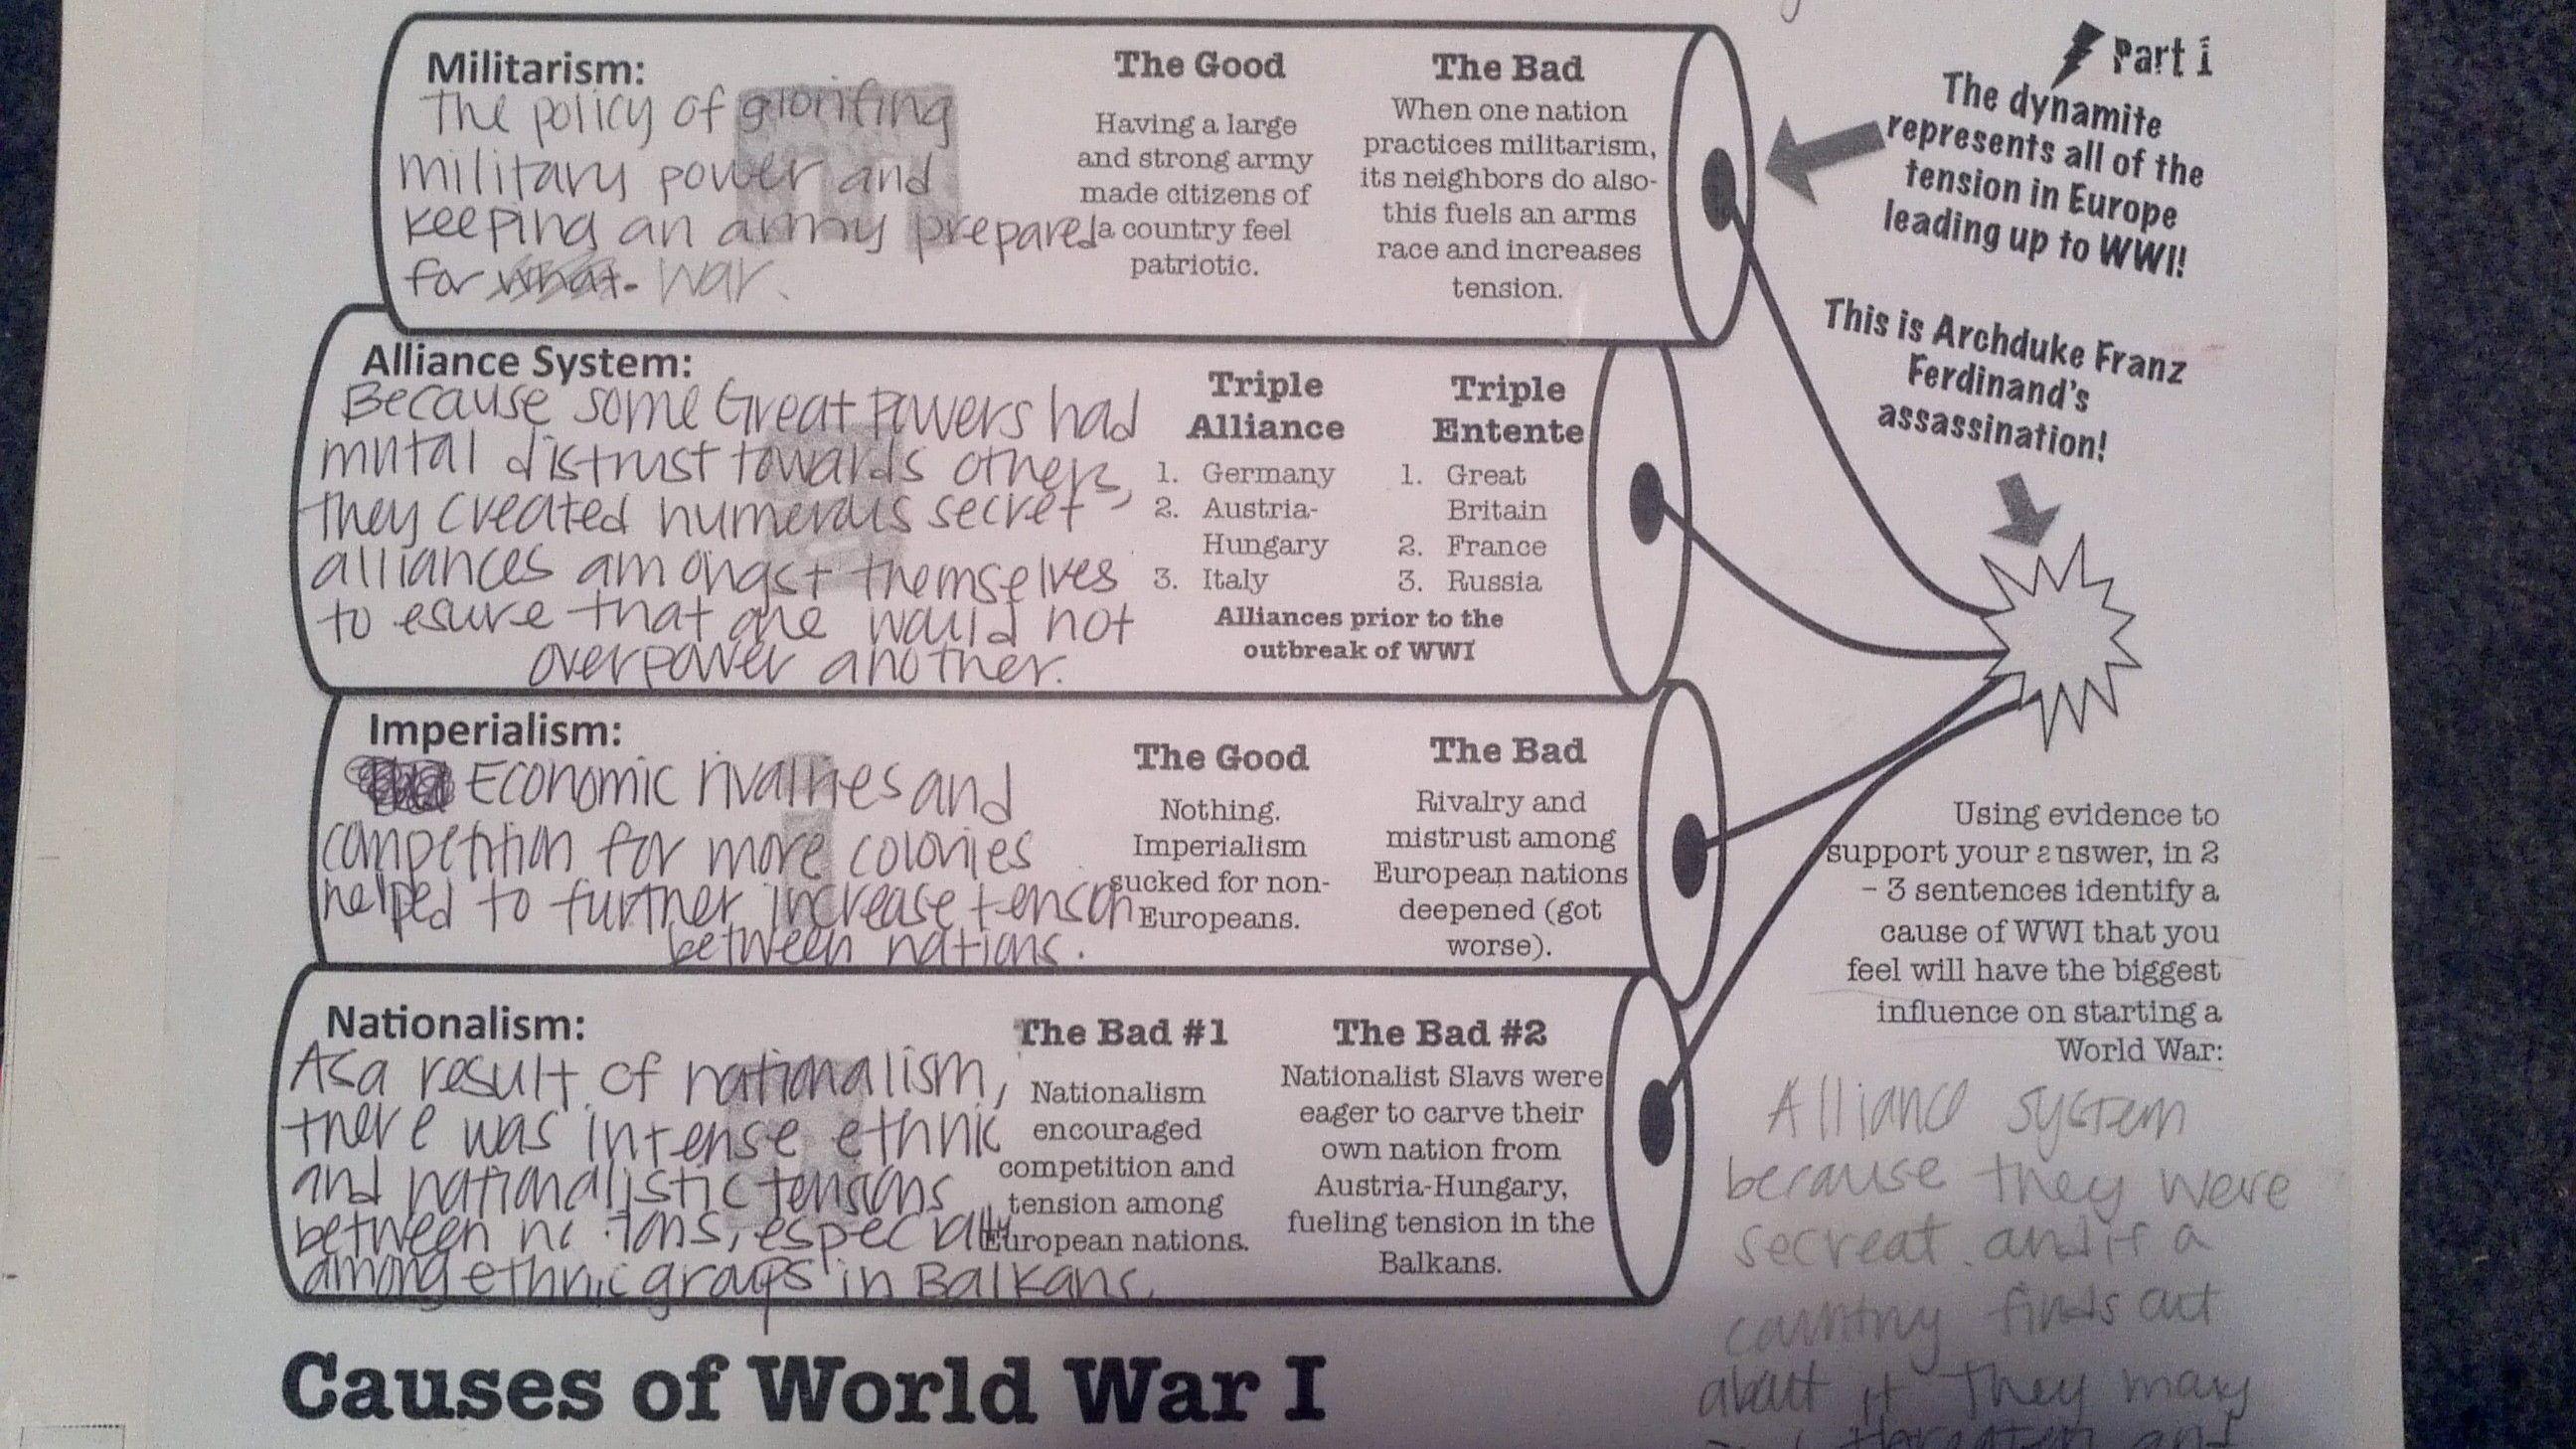 causes of world war 1 essay imperialism 1 world war 1 essay world war i the best known cause of world war i was the alliance system that imperialism, and nationalism world war i was a global war.